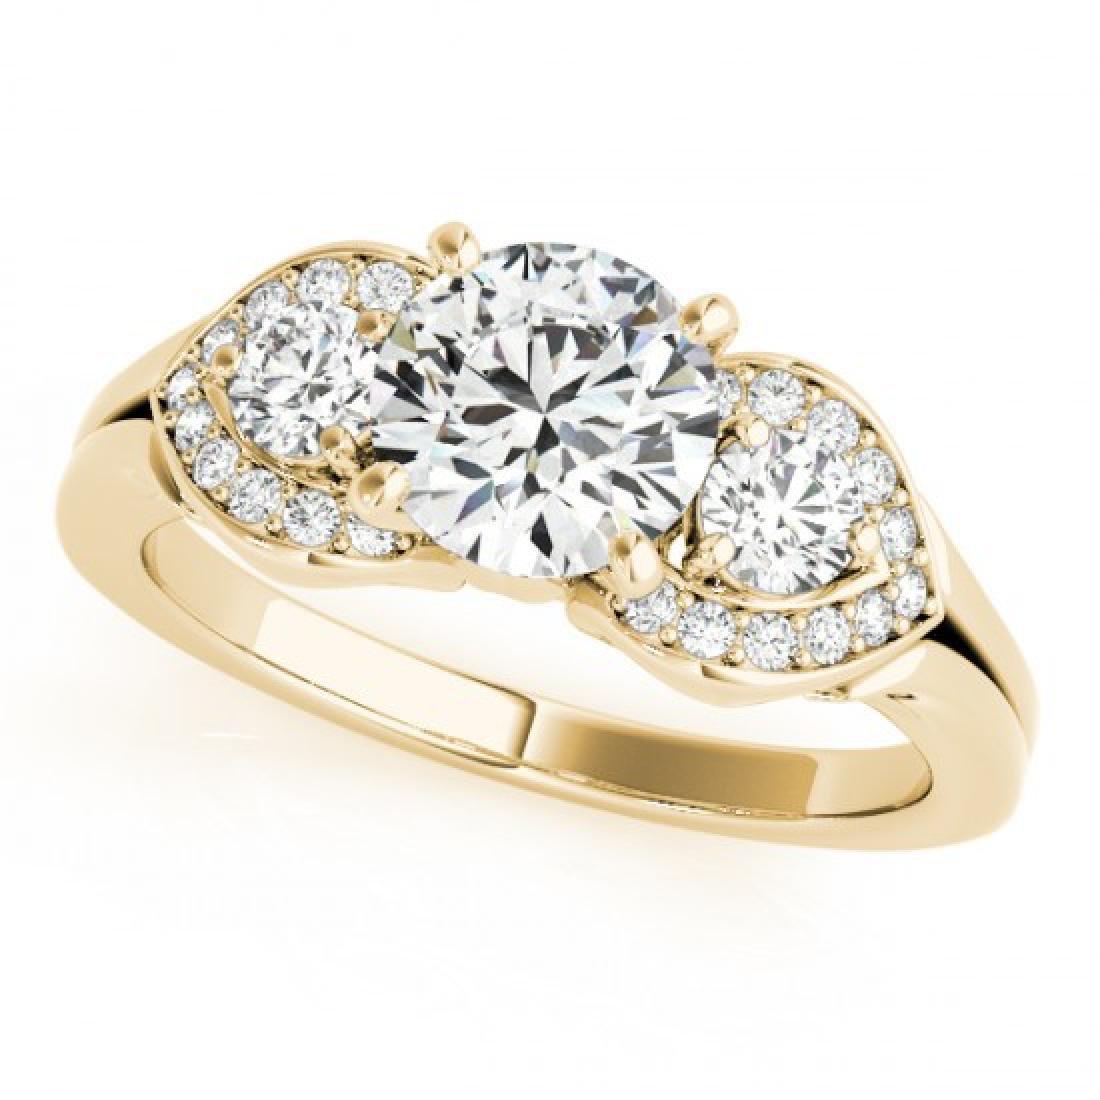 1.7 CTW Certified VS/SI Diamond 3 Stone Ring 14K Yellow